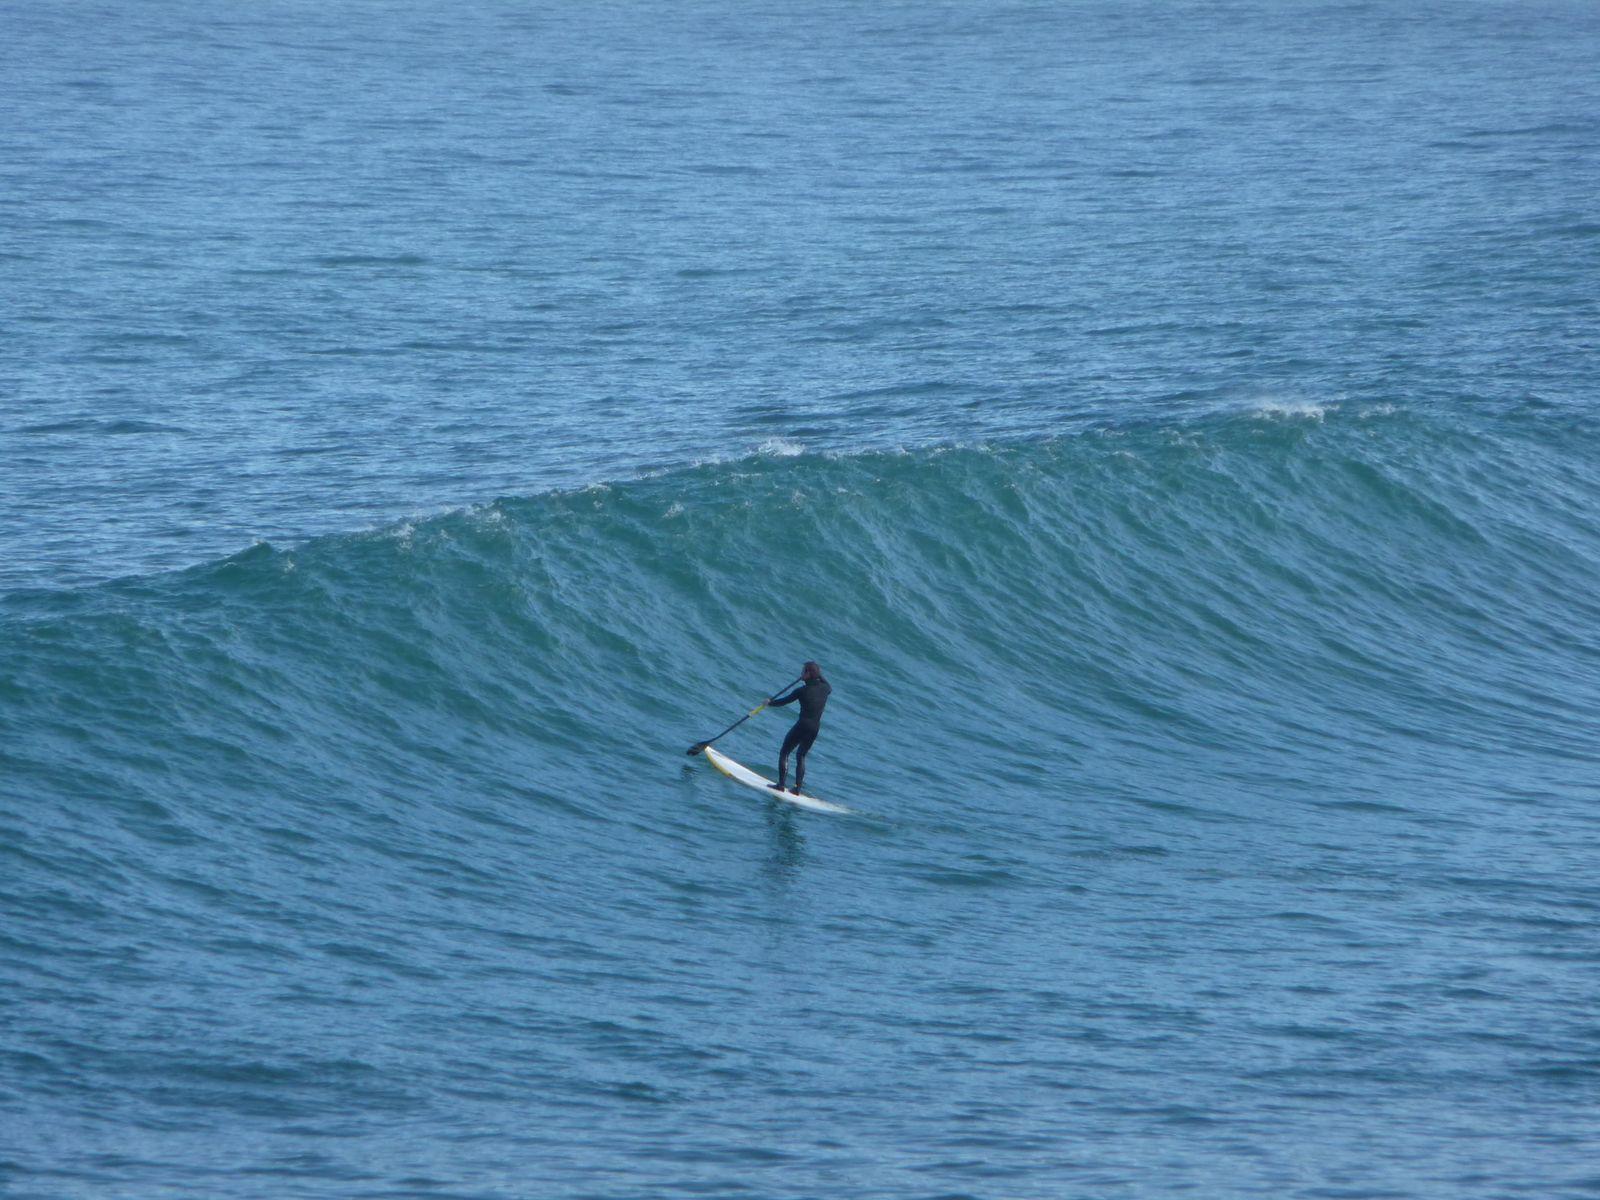 surf golf galea getxo bizkaia%2B%252810%2529